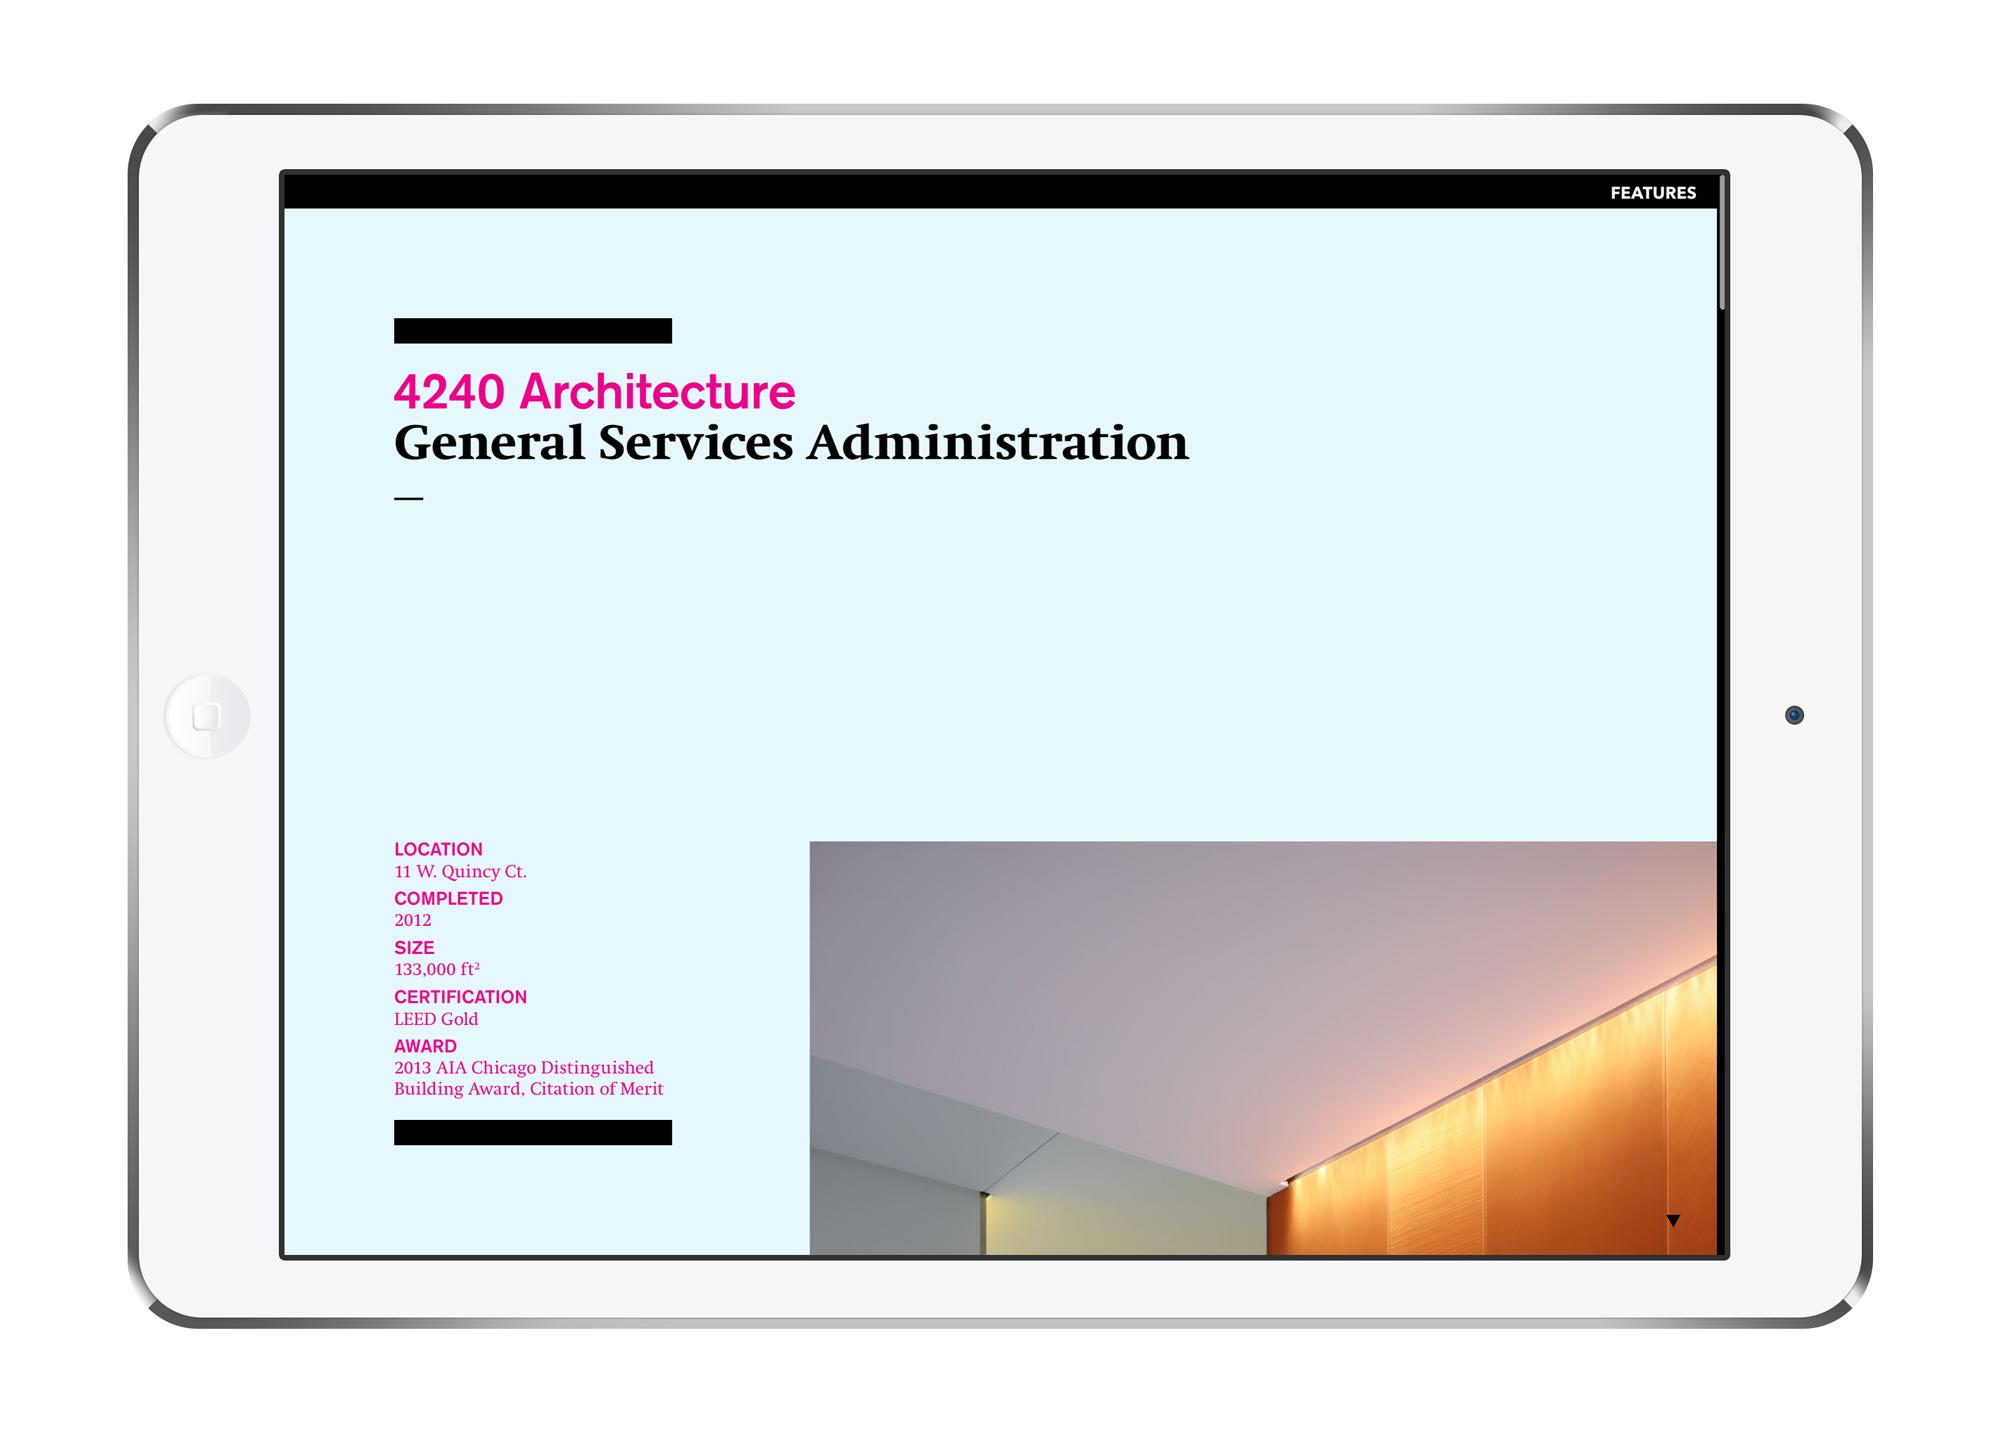 GBD_iPad_Feature-AIA-2.jpg